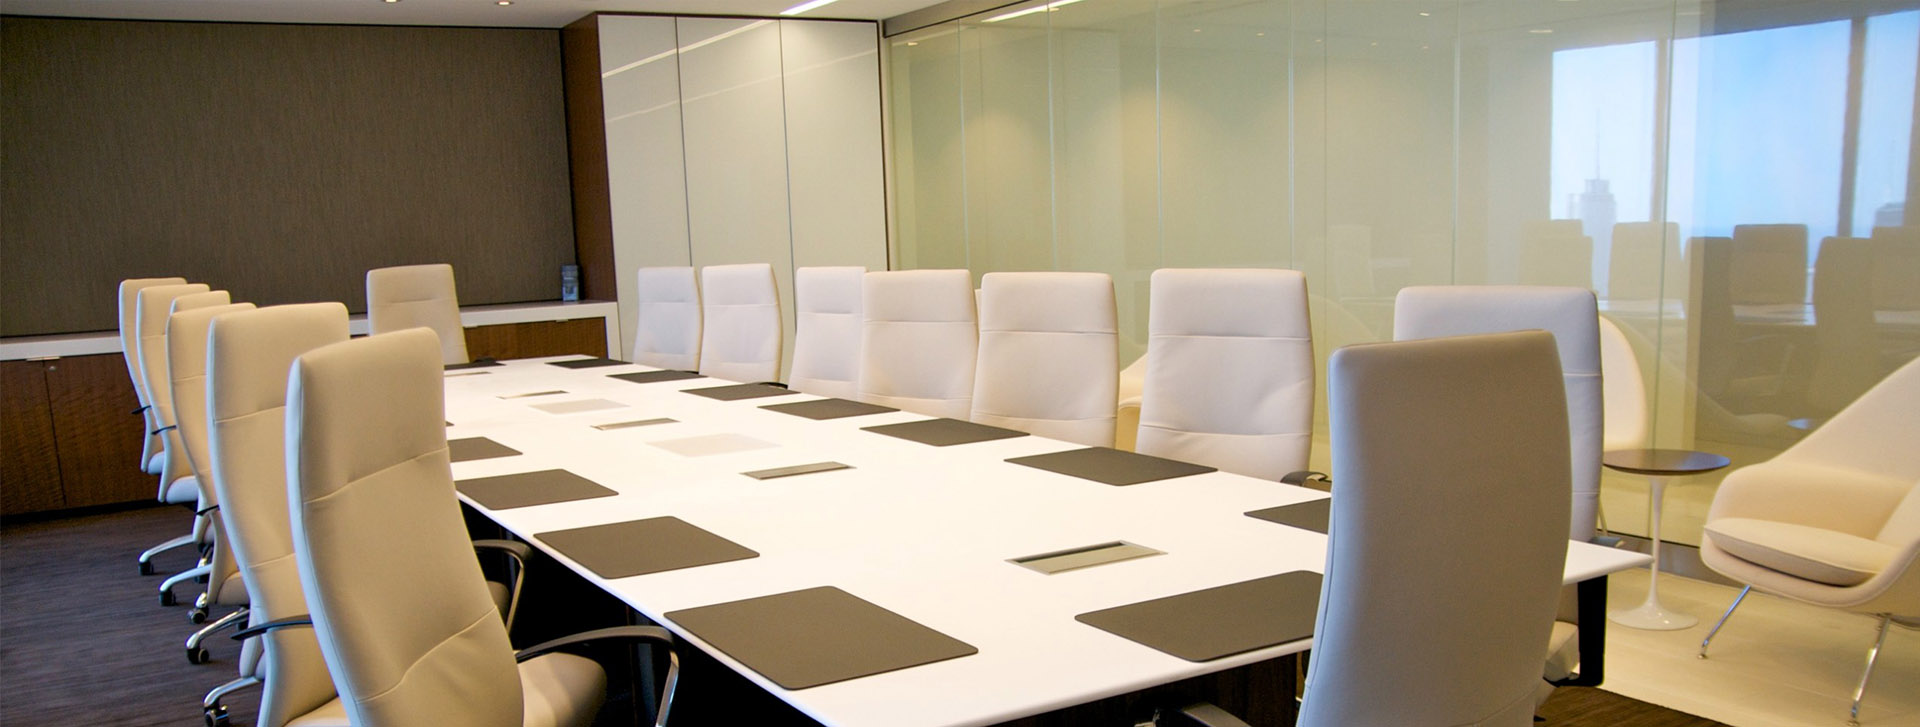 Foto Diplomacia Business Class cursos